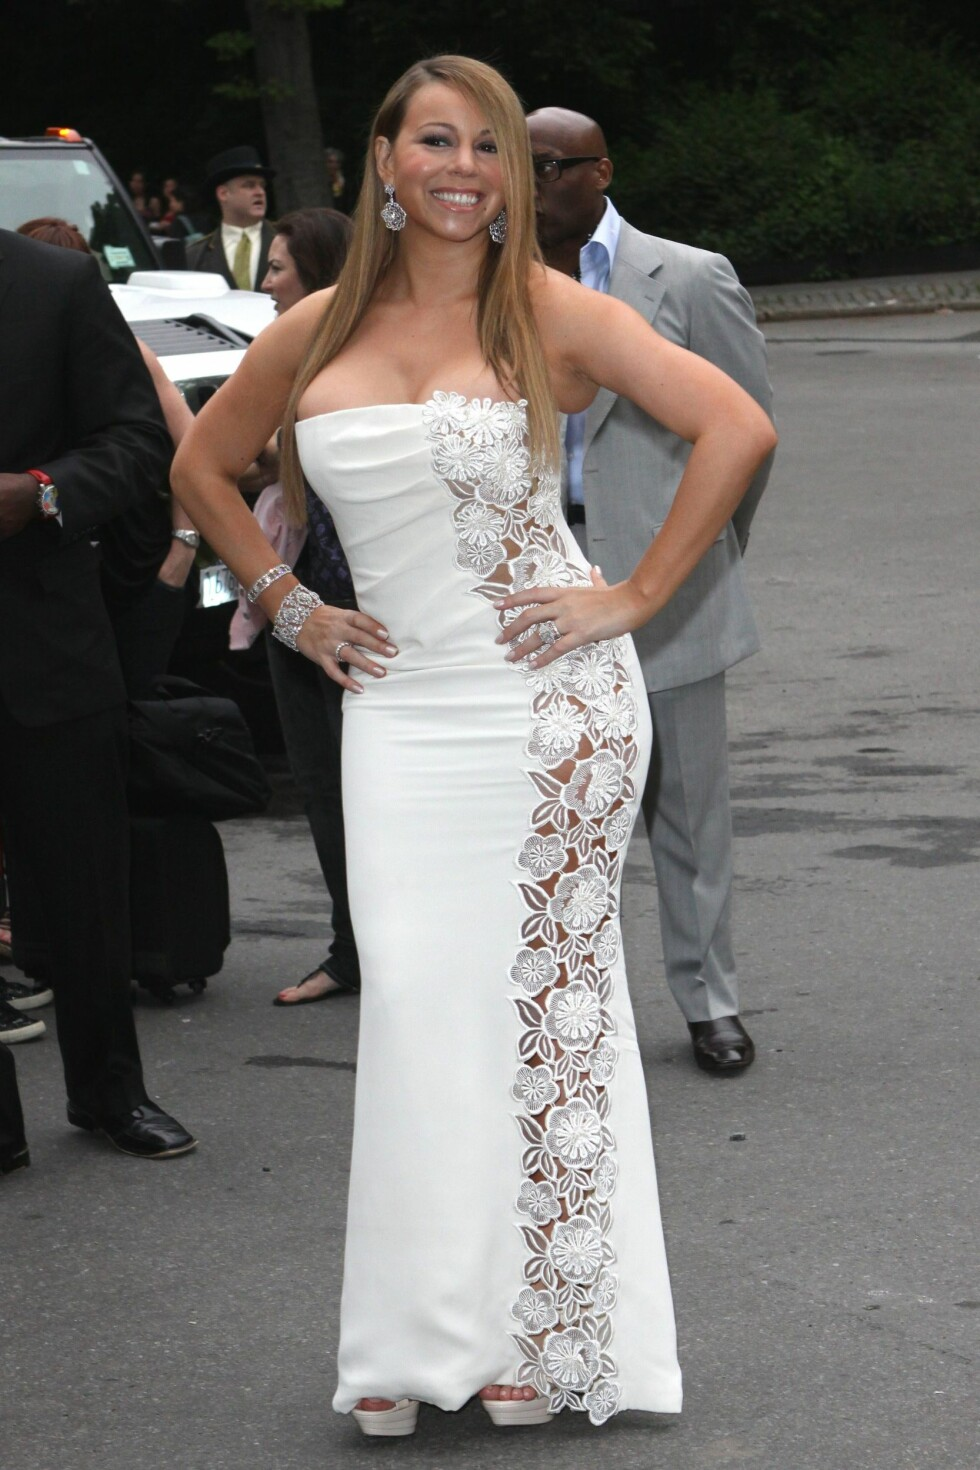 SPRETNE PUPPER: Popstjernen Mariah Carey kunne med fordel toned ned denne harry havfruekjolen sin noen hakk.  Foto: All Over Press